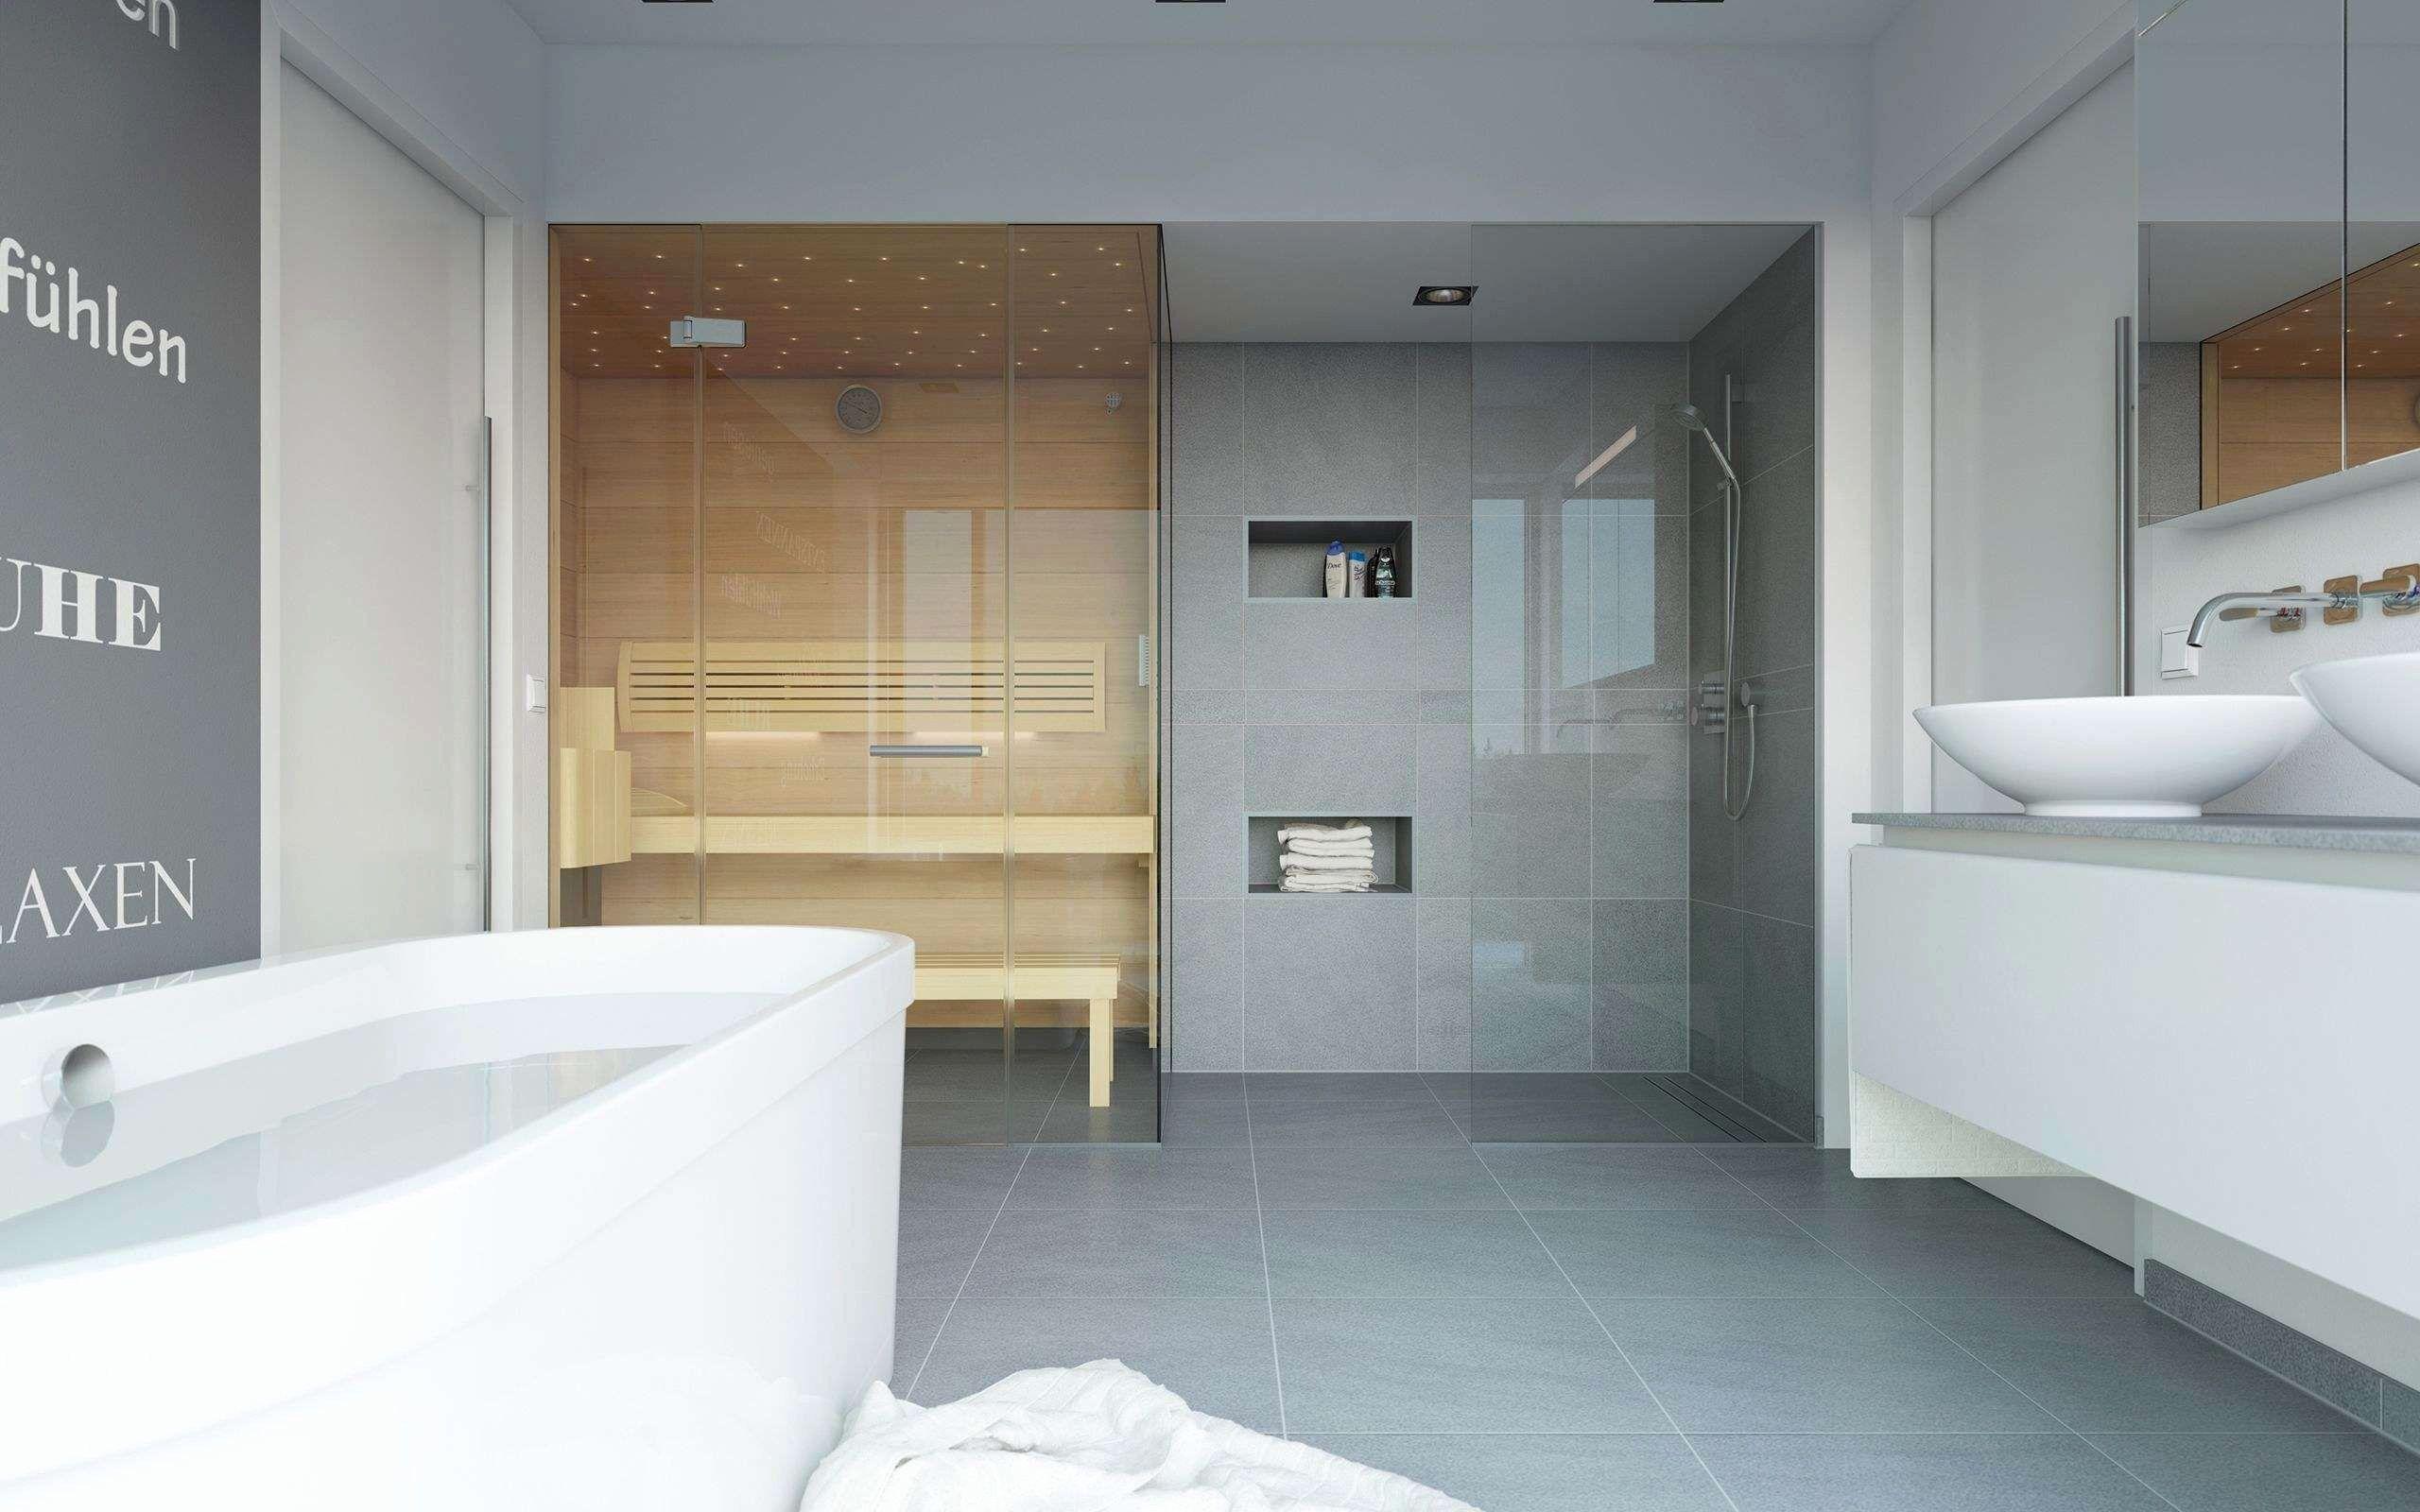 13 Badezimmer Inspiration Luxus Bad In Holzoptik Elegant Pvc Badezimmer Eintagamsee Sauna Bathroom Design Modern Bathroom Modern Bathroom Design